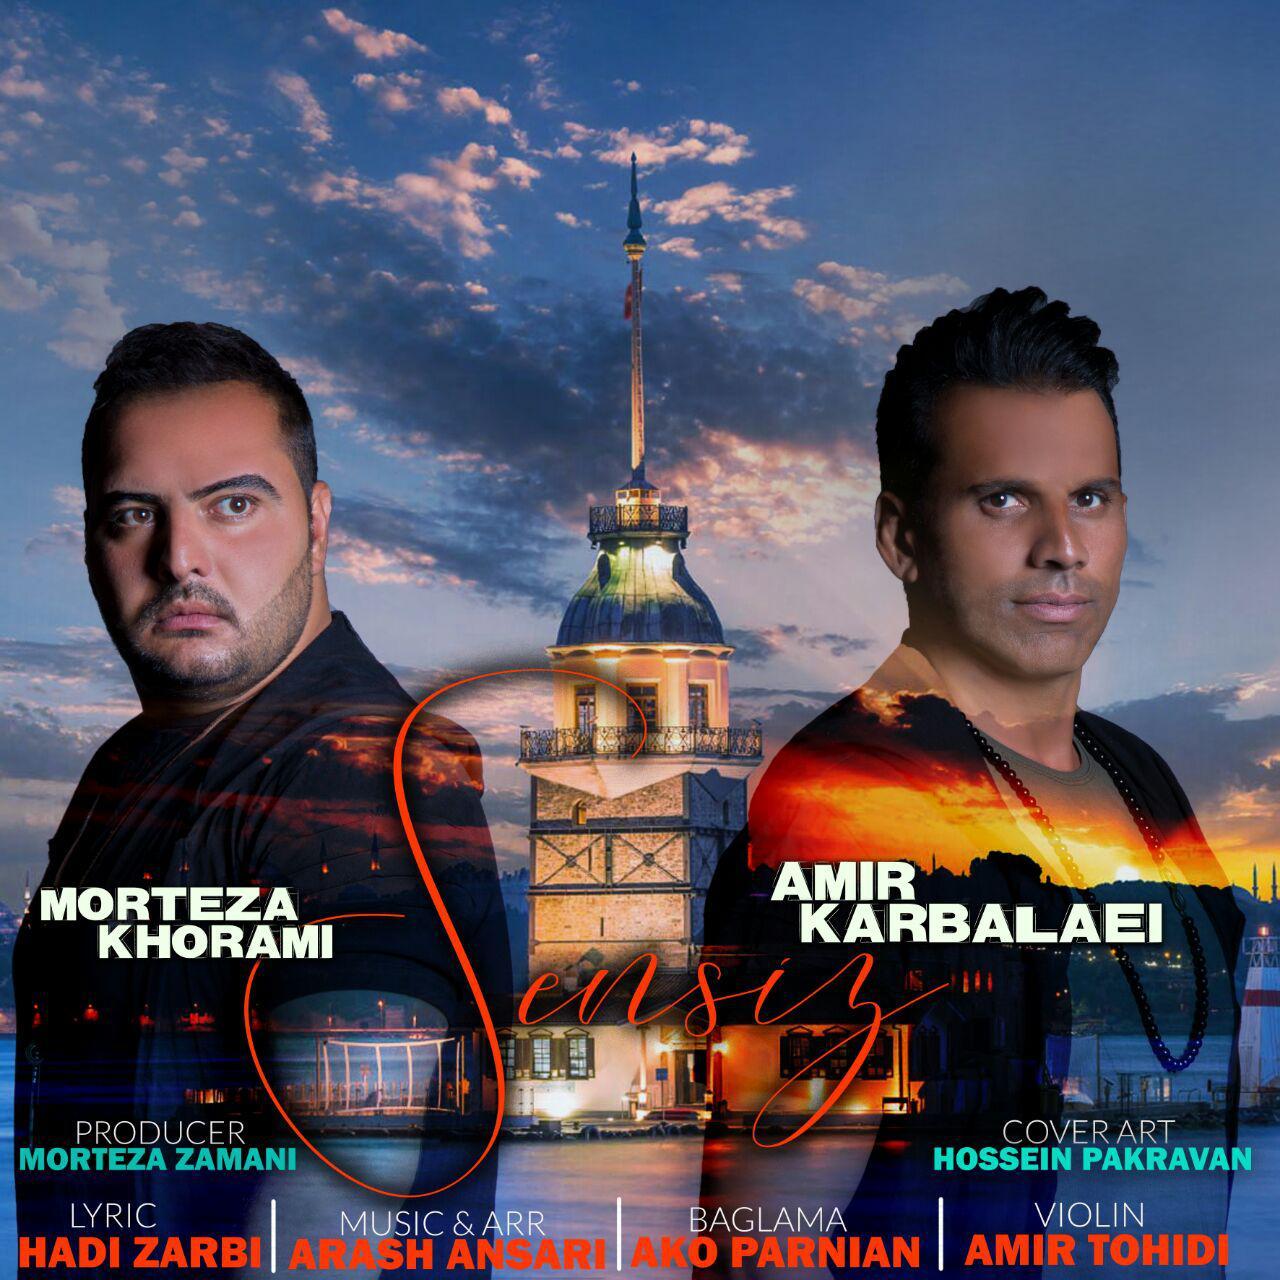 Morteza Khorami & Amir Karbalaei – Sen Siz